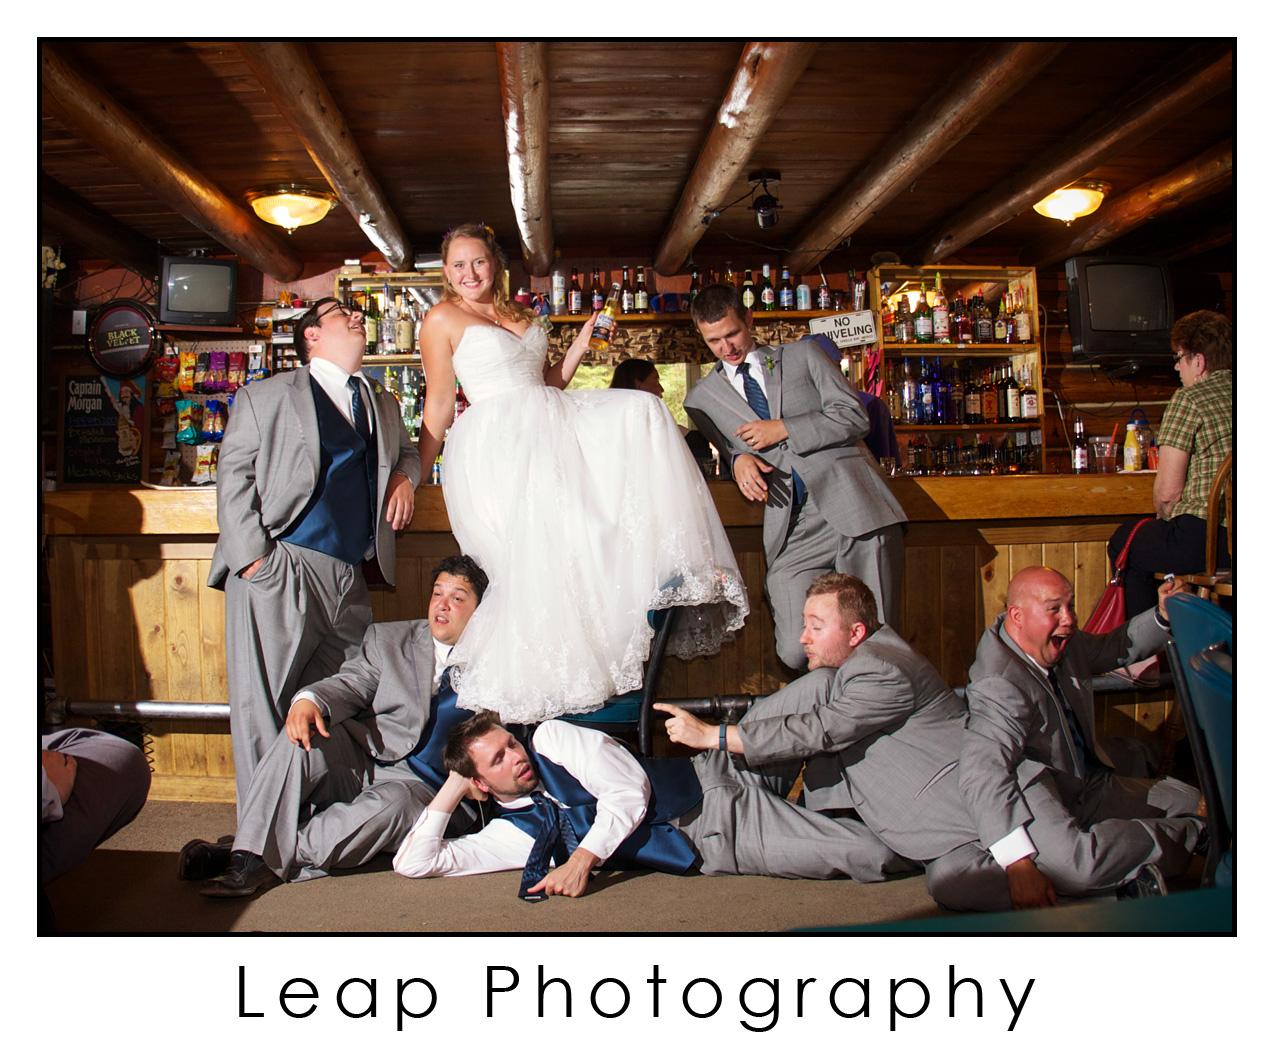 Boise_Idaho_Wedding-Photographers_Warm-Lake_010A